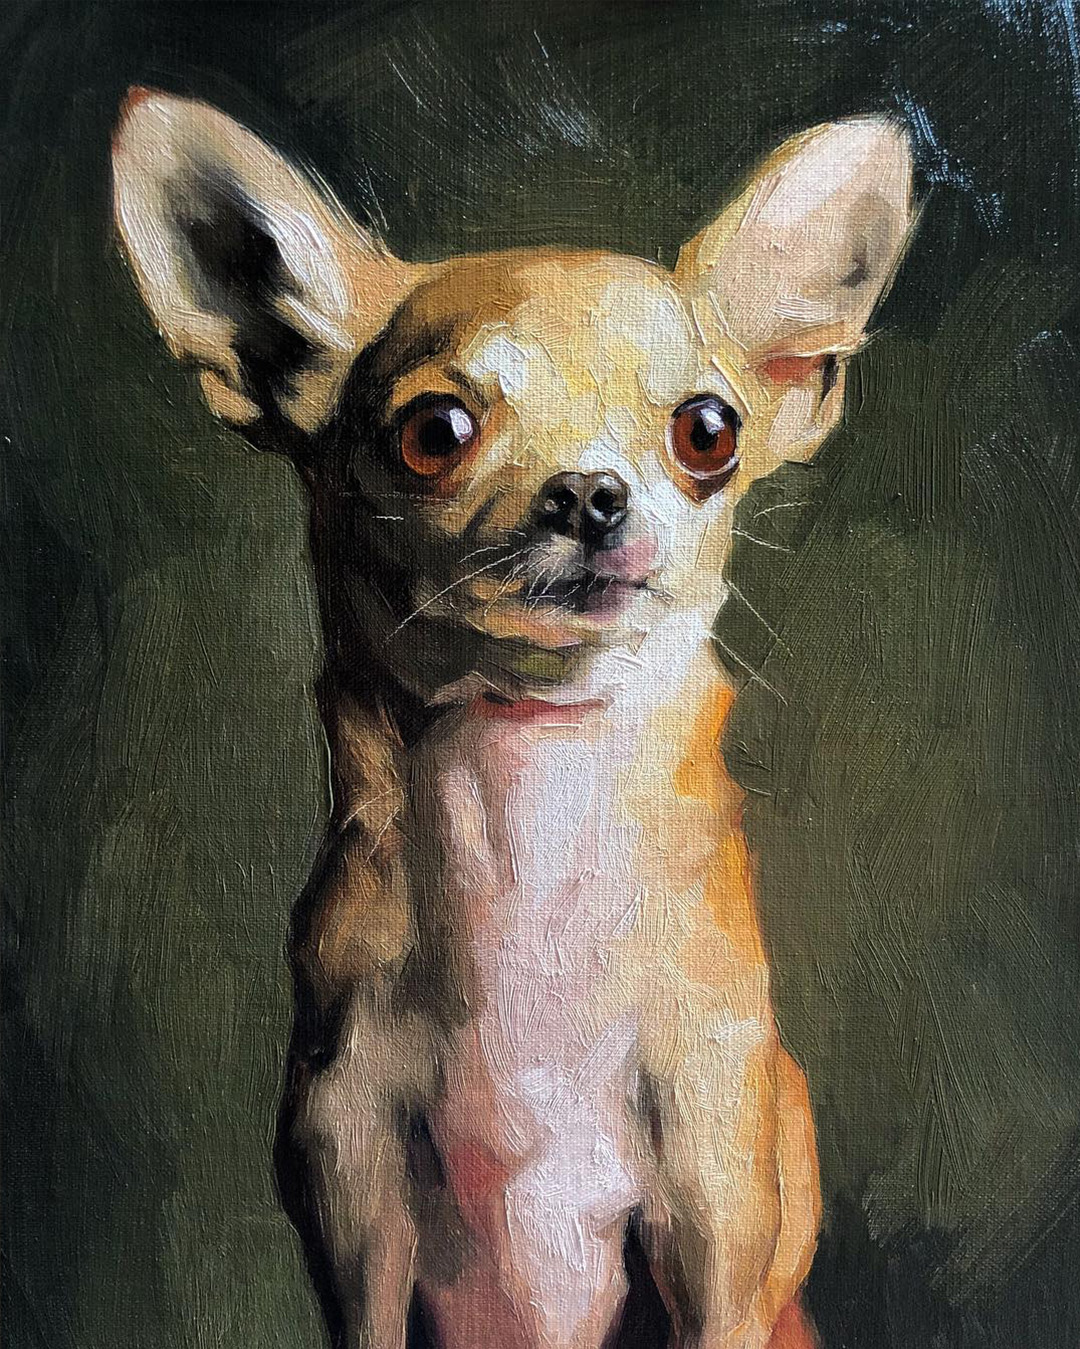 chihuahua-paiting-artist-jennifer-gennari